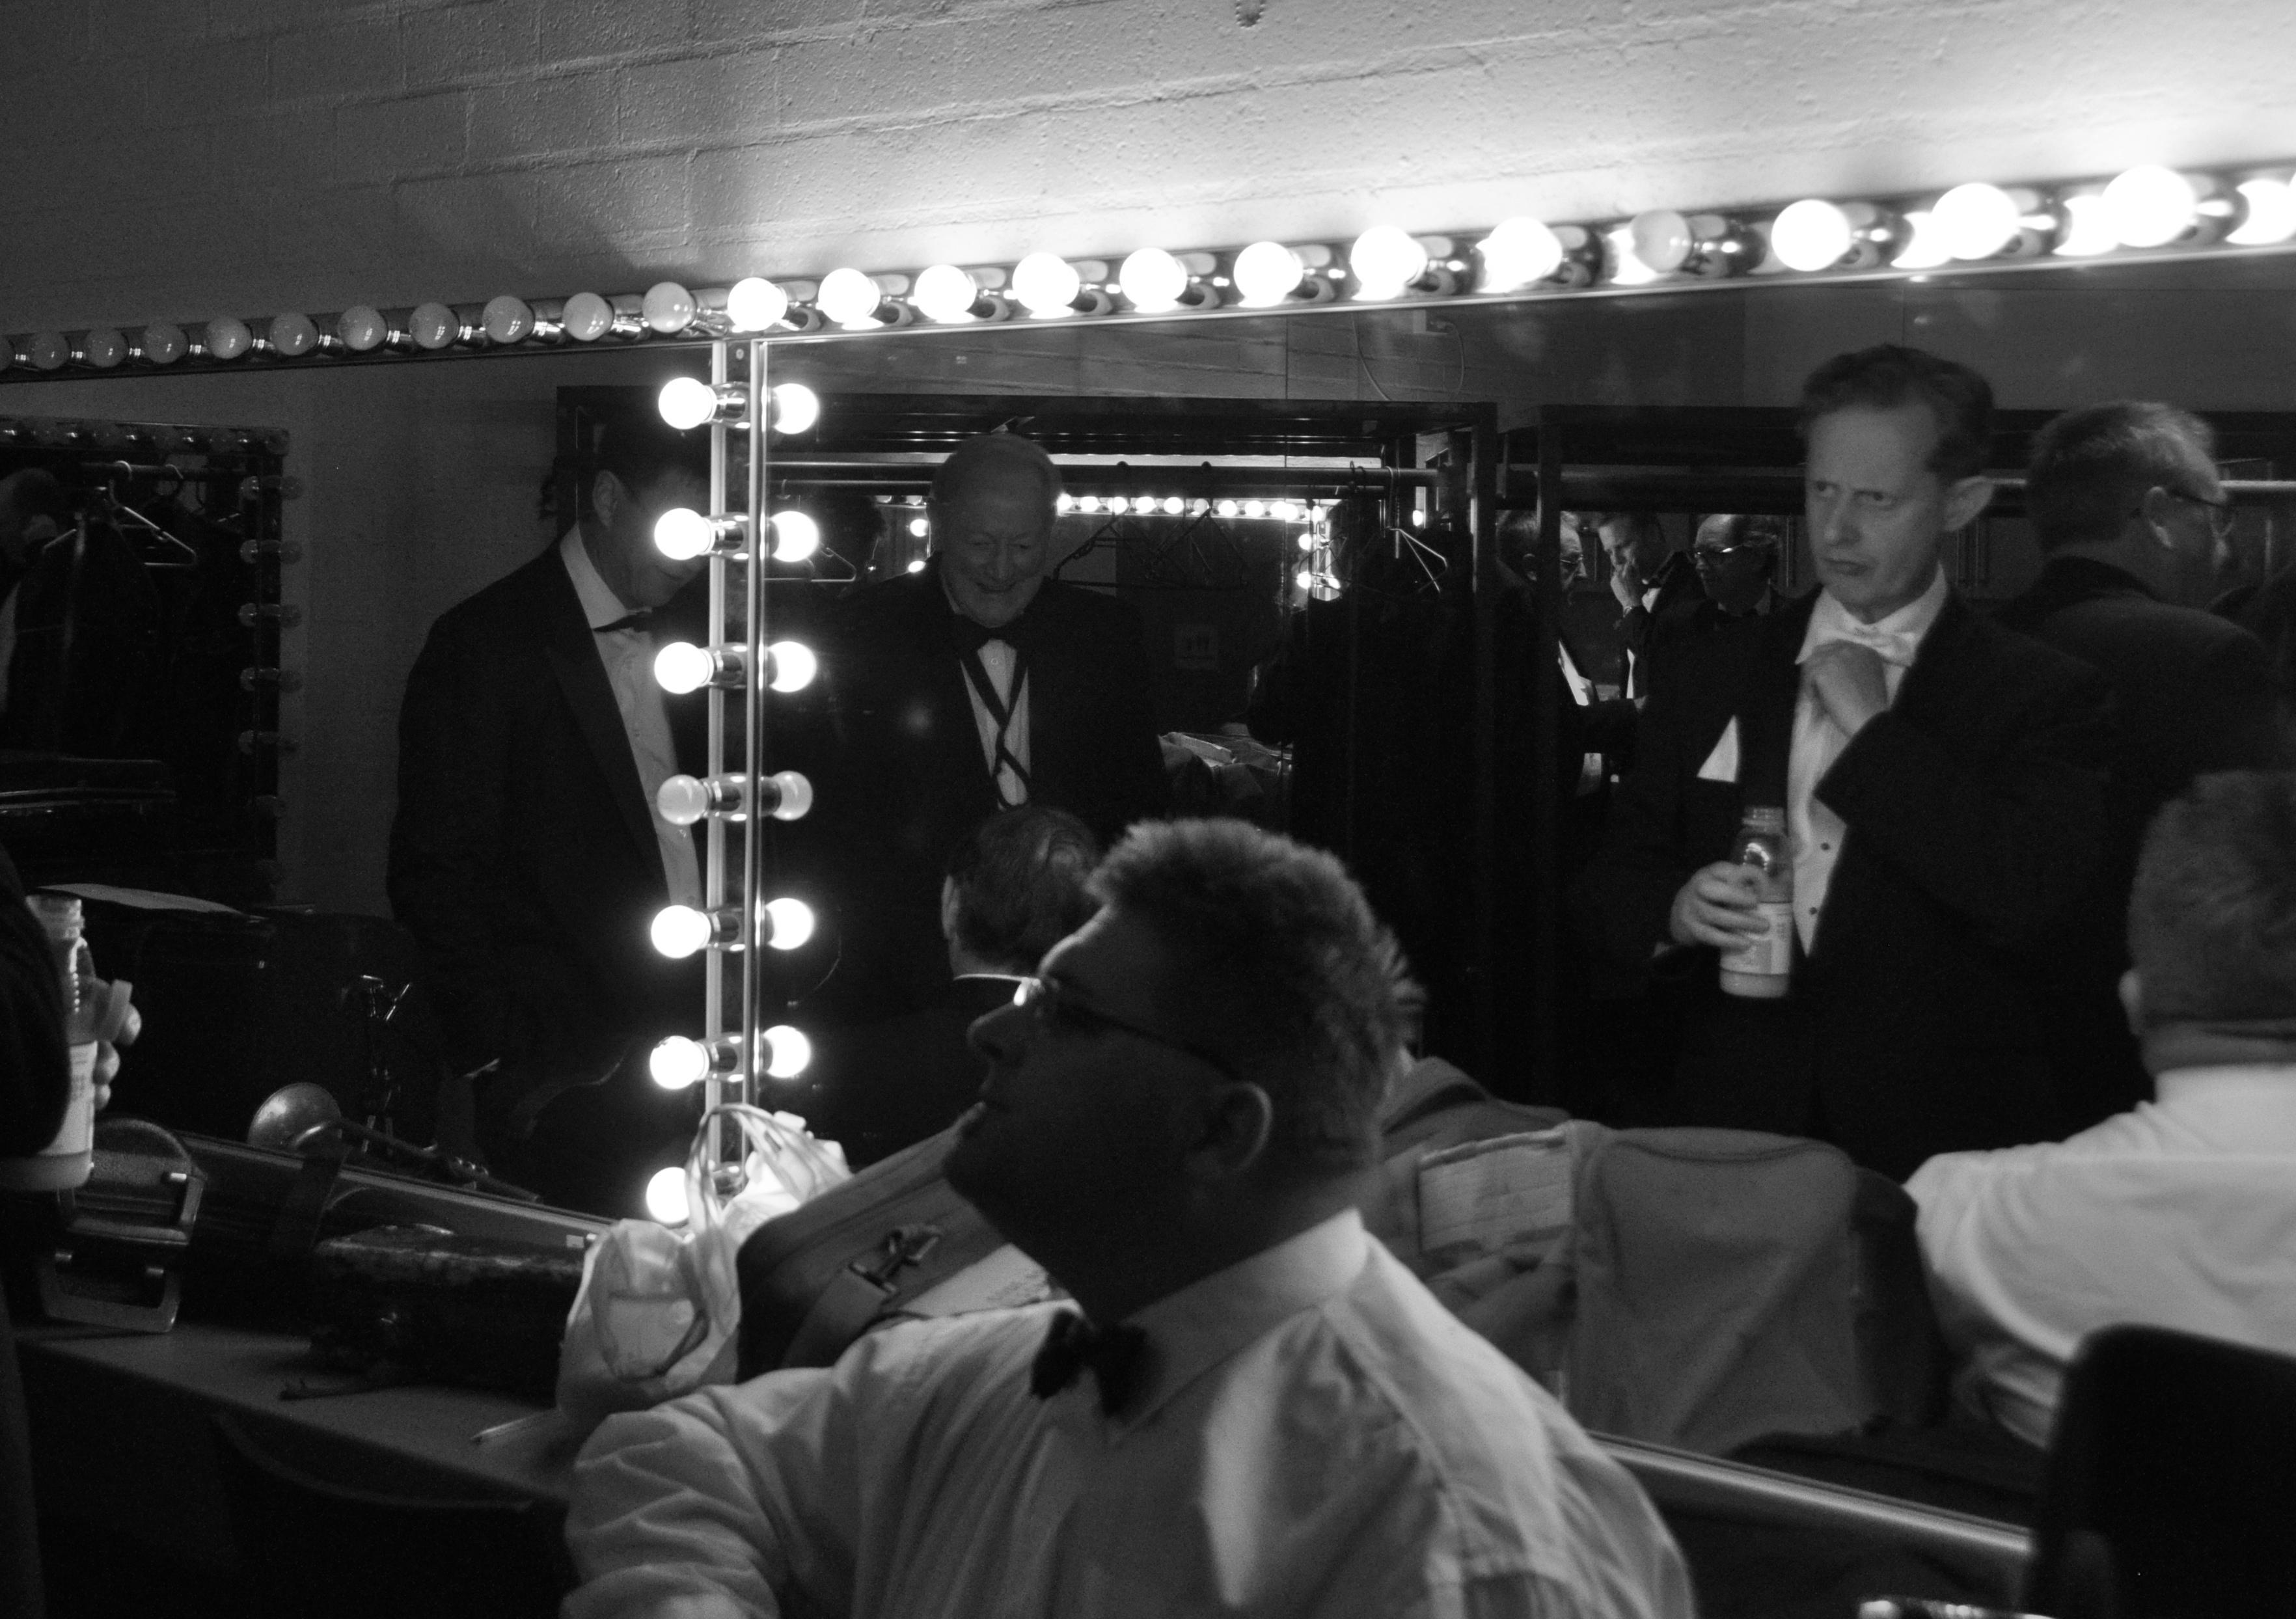 backstage_mirror_rogn_-1476102926.jpg